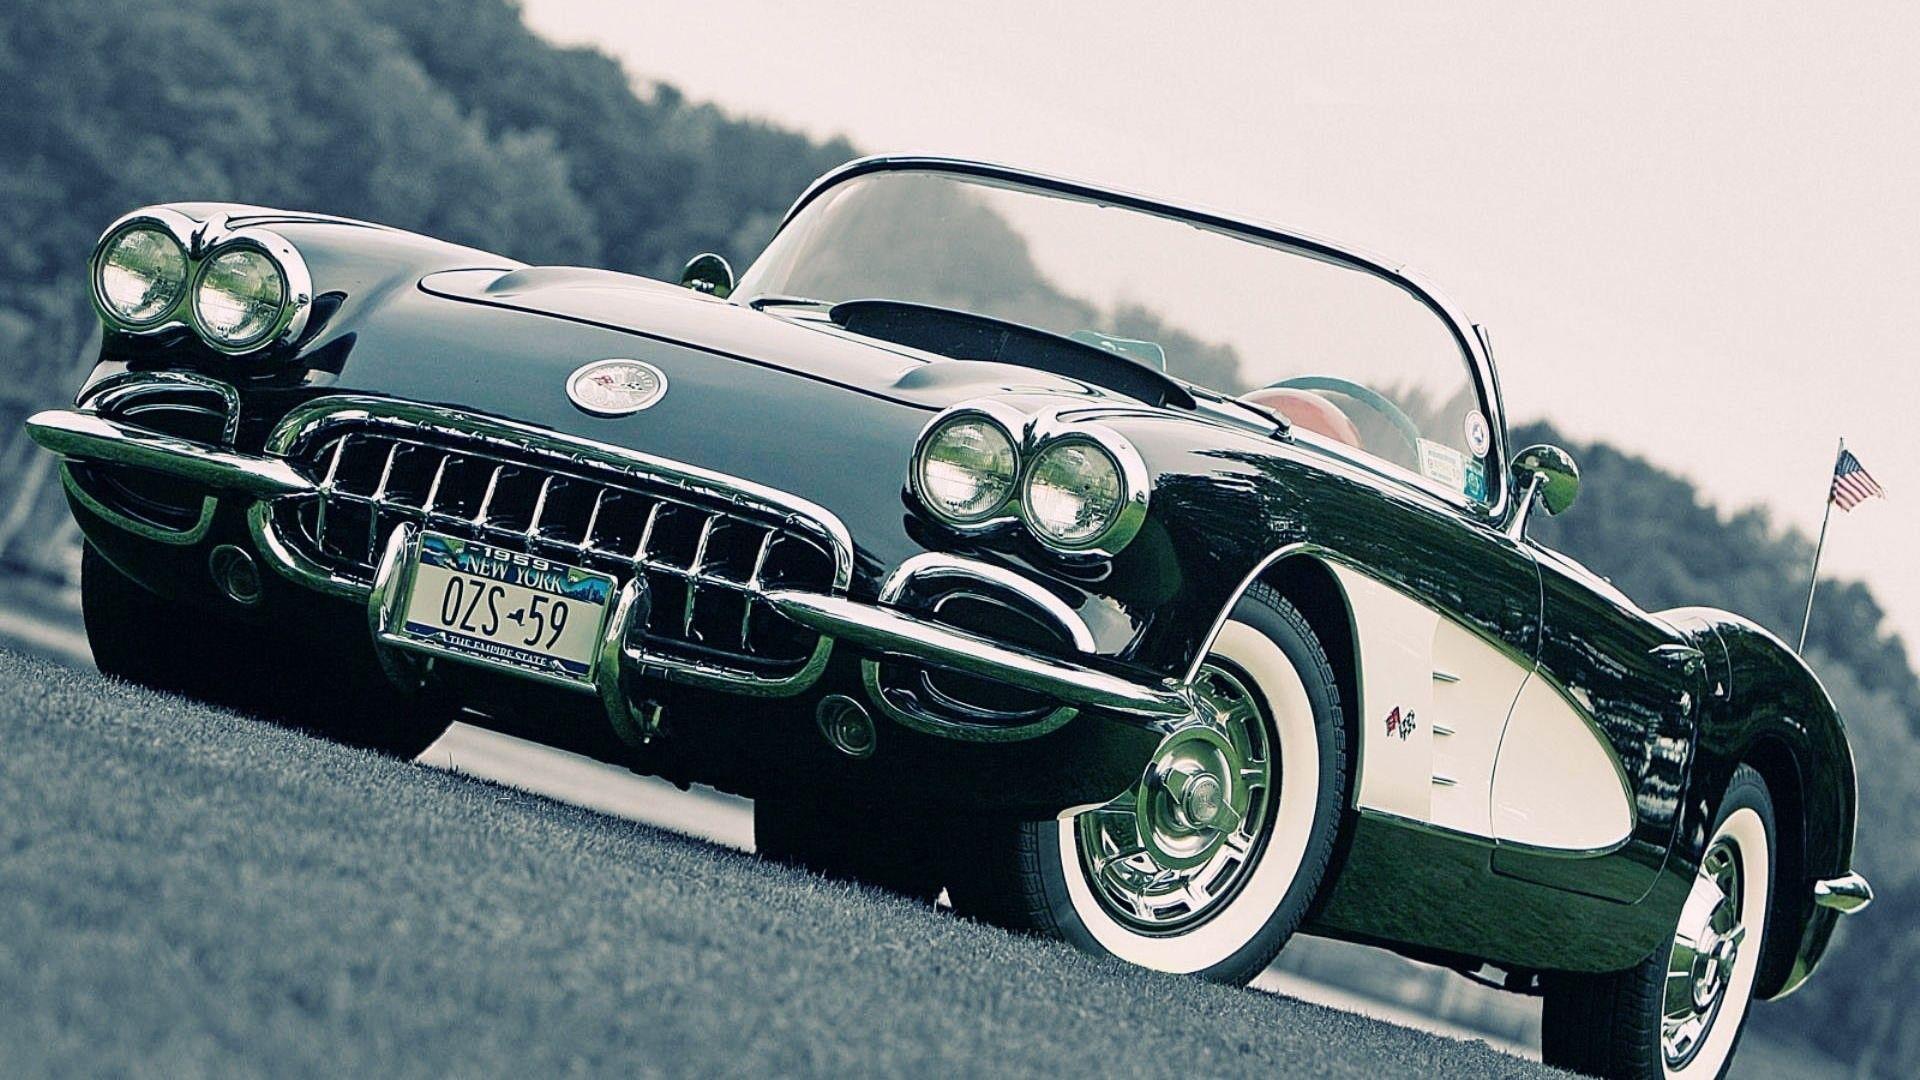 Old Cars Wallpaper Hd